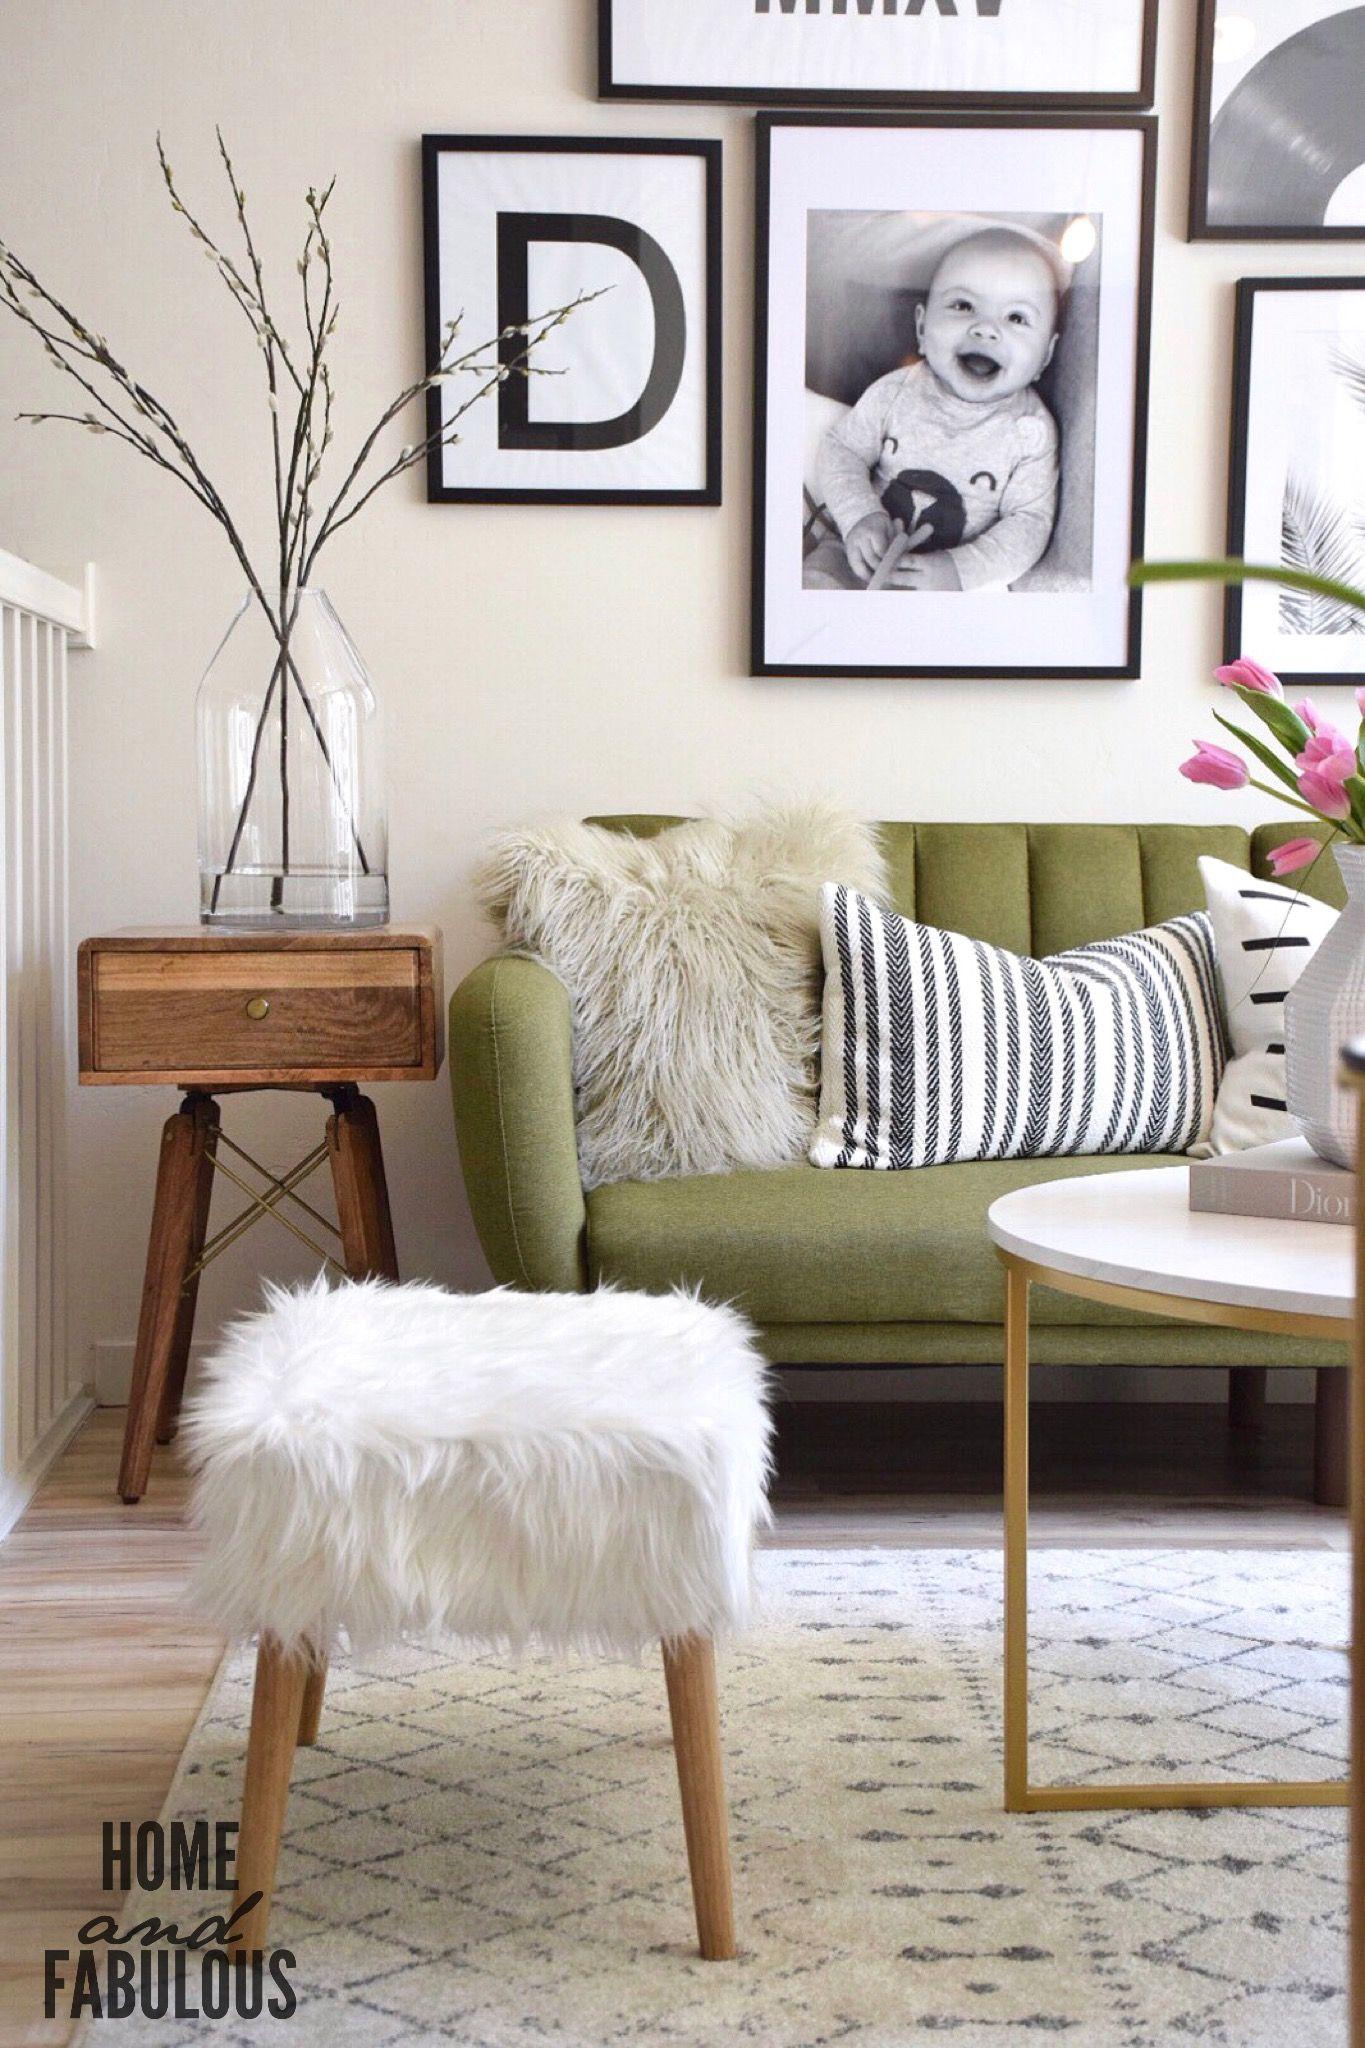 Small Home Big Style | Home goods, Home decor, Living room ...